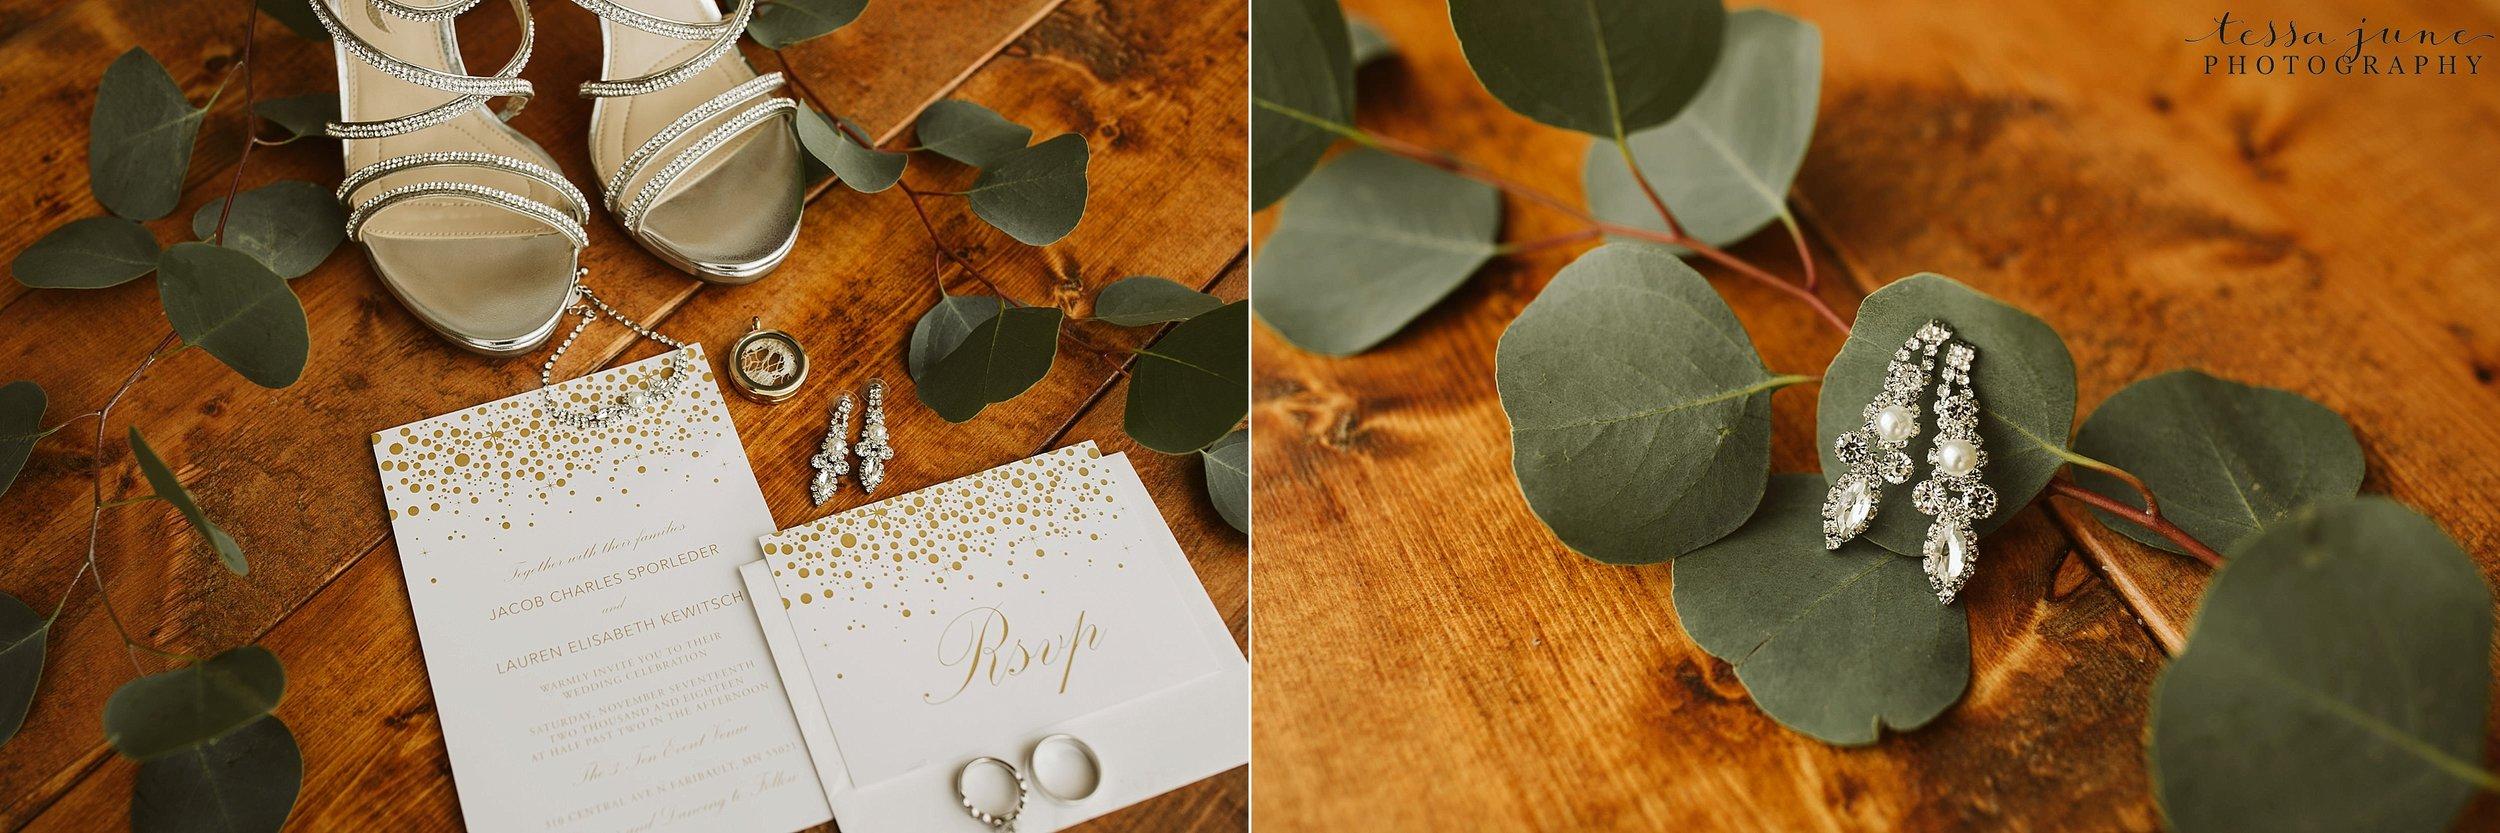 the-3-ten-event-venue-november-elegant-cozy-wedding-faribault-minnesota-3.jpg